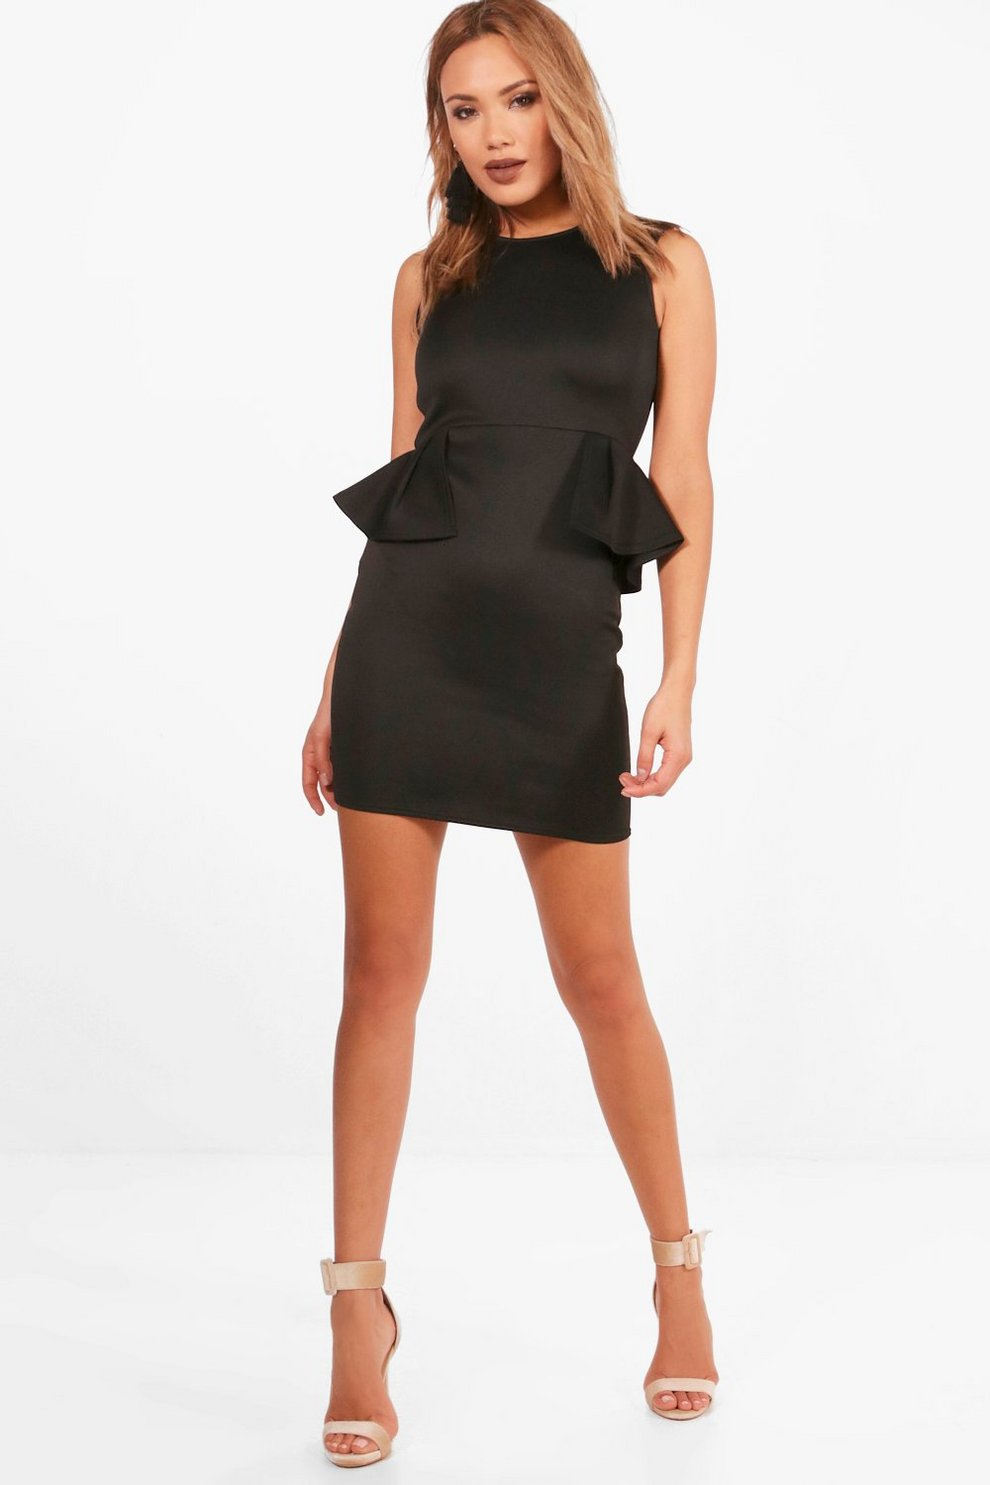 2e1d234c4eb boohoo black peplum dress – Little Black Dress